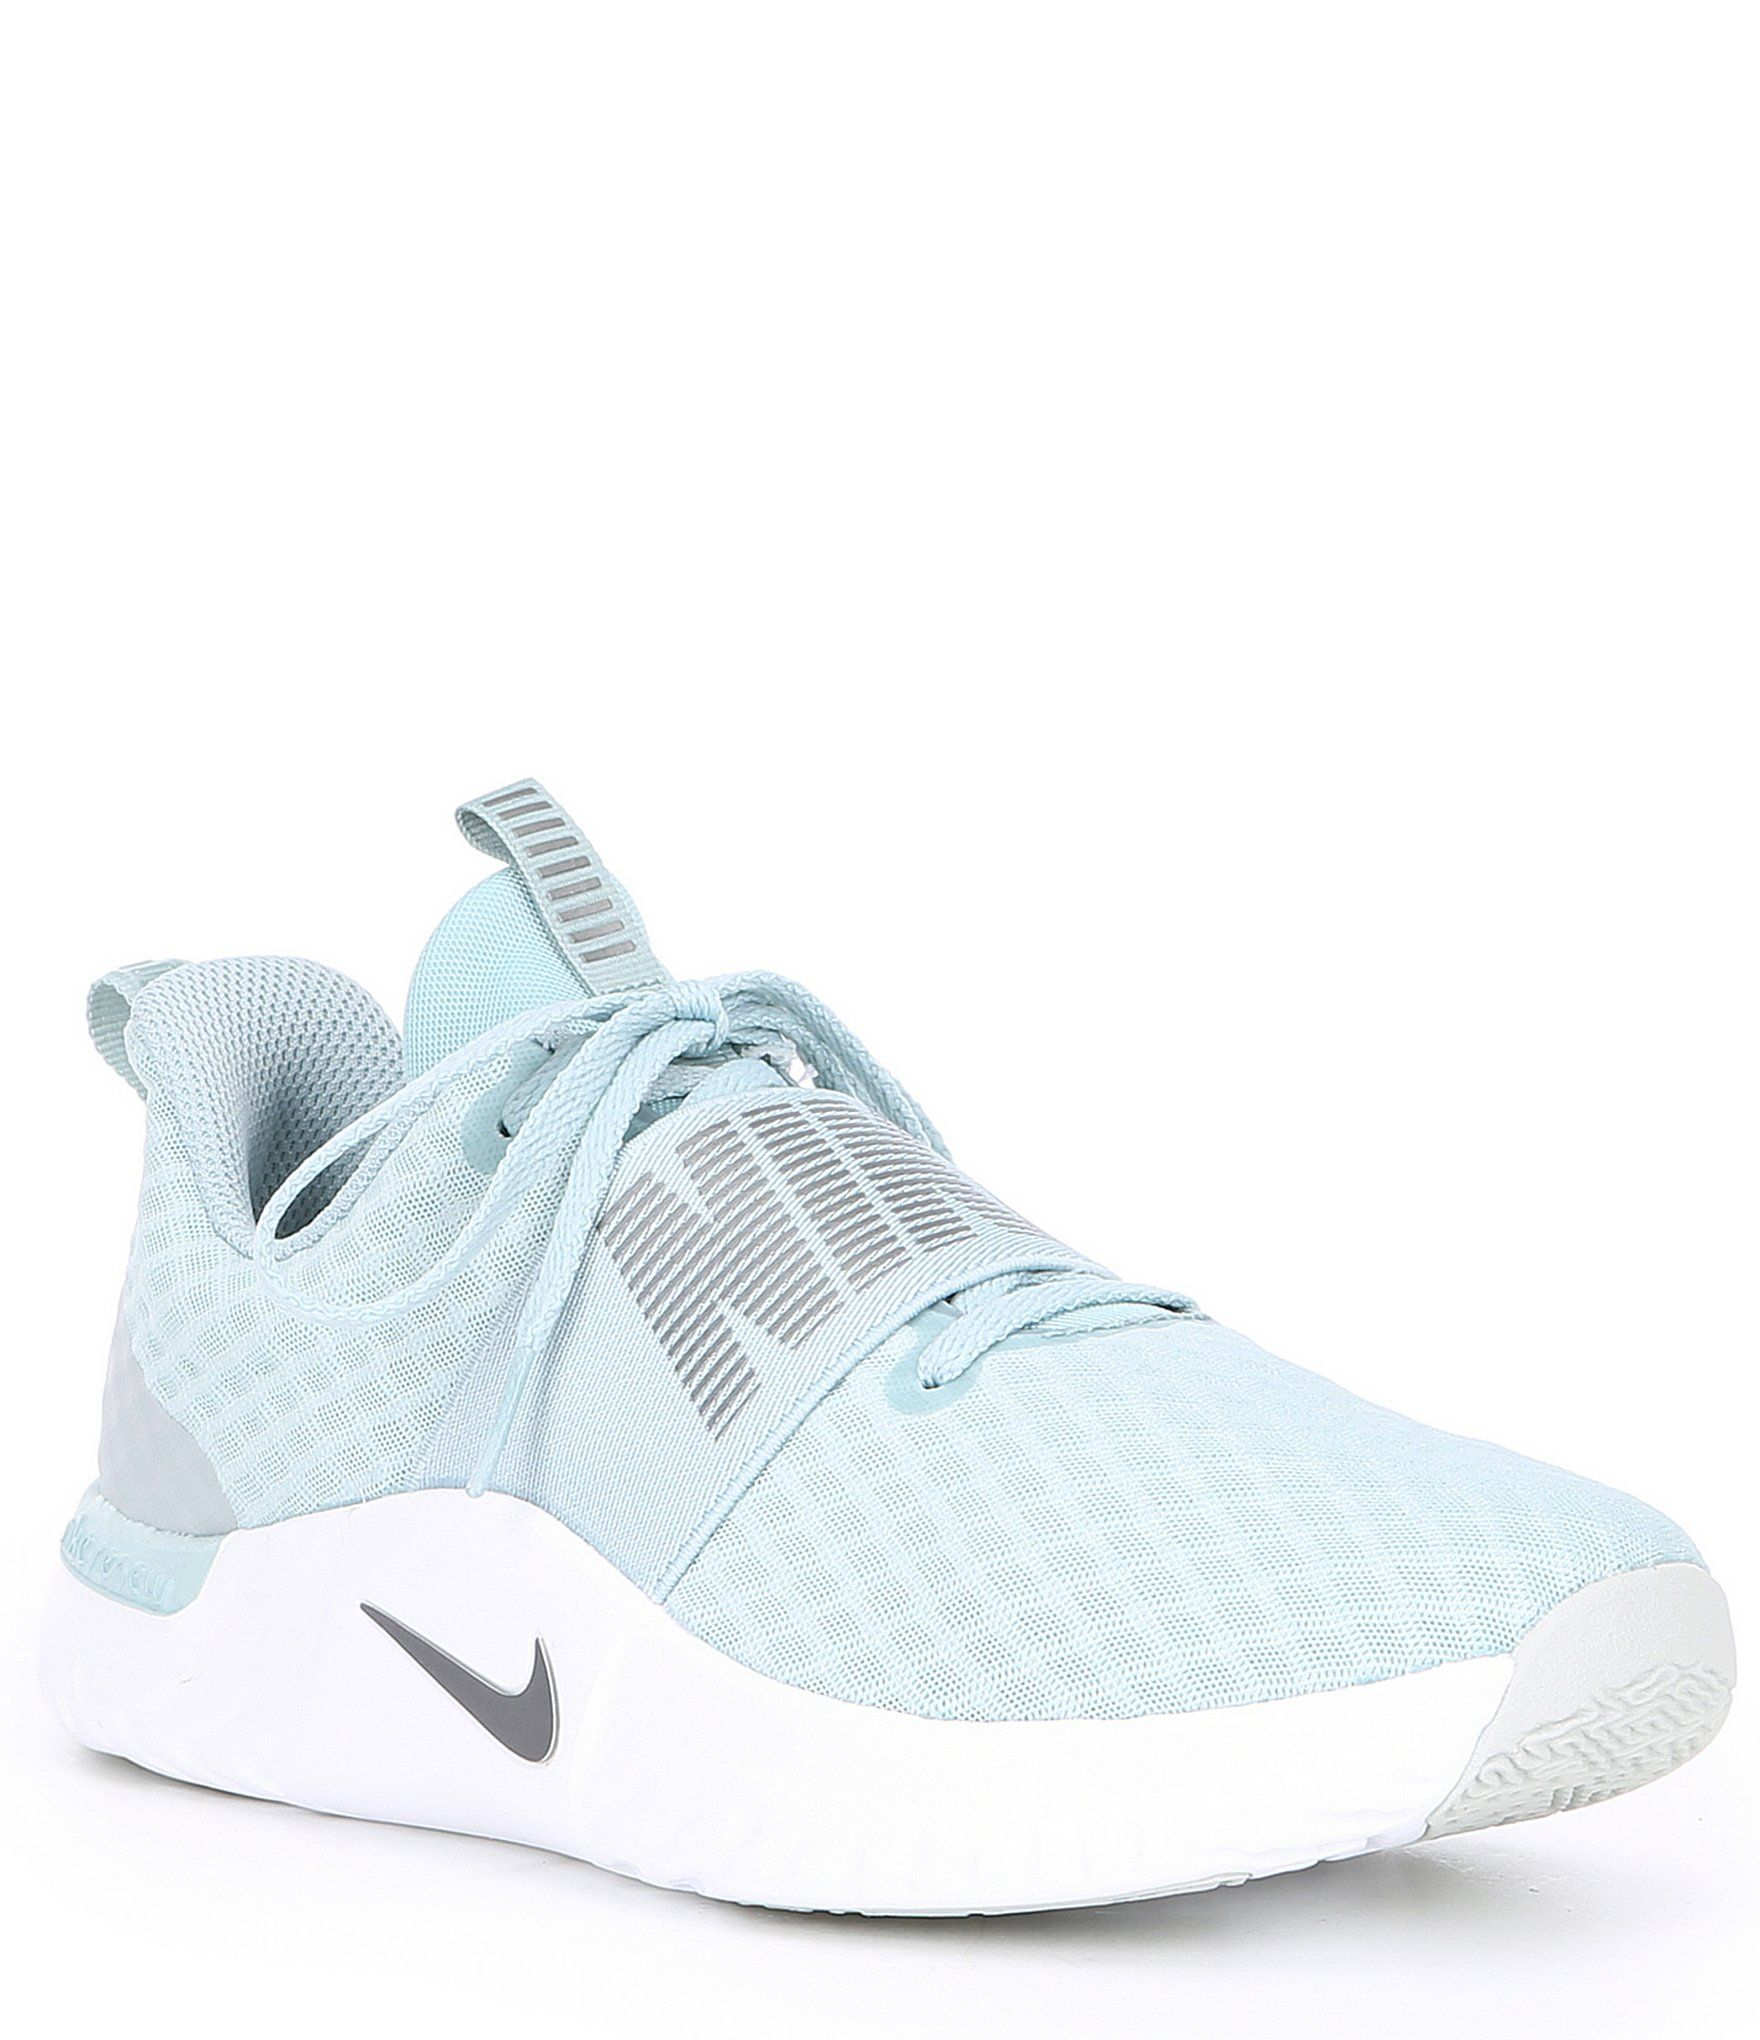 Nike Women's Renew In-Season TR 9 Training Shoes | Dillard's ...